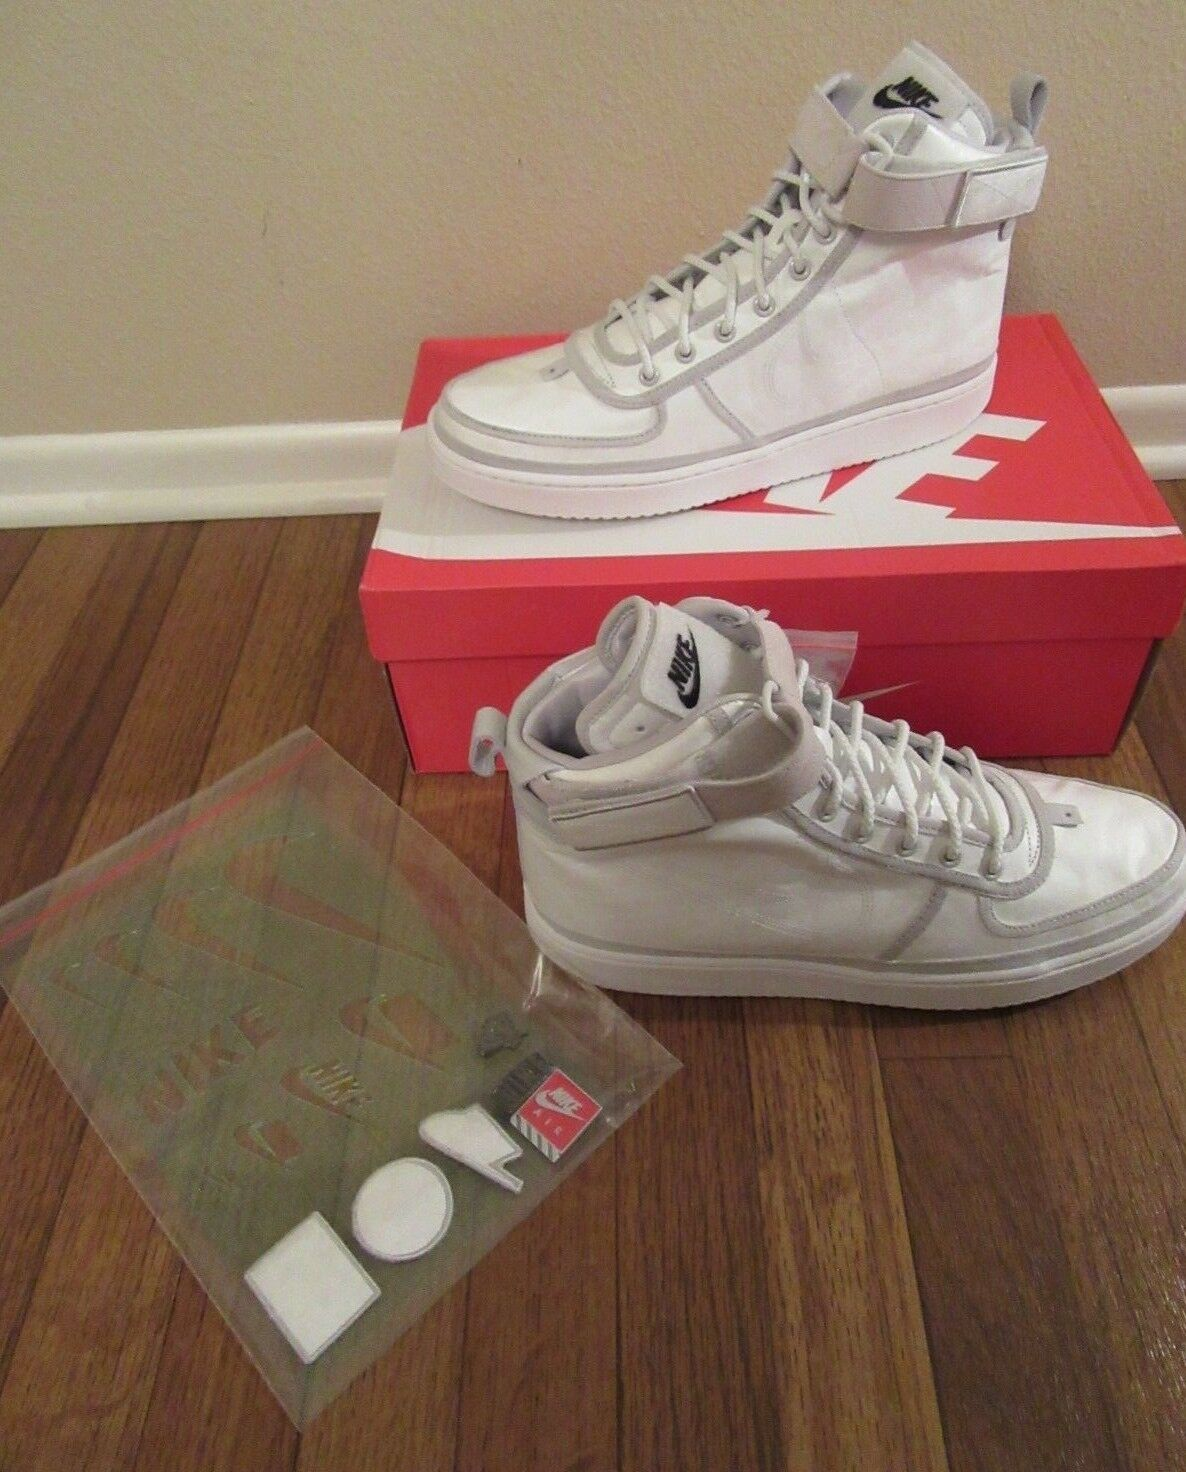 Nike Vandal High Supreme AS QS 90/10 Size 11 Vast Grey White AQ0113 001 Maker LA